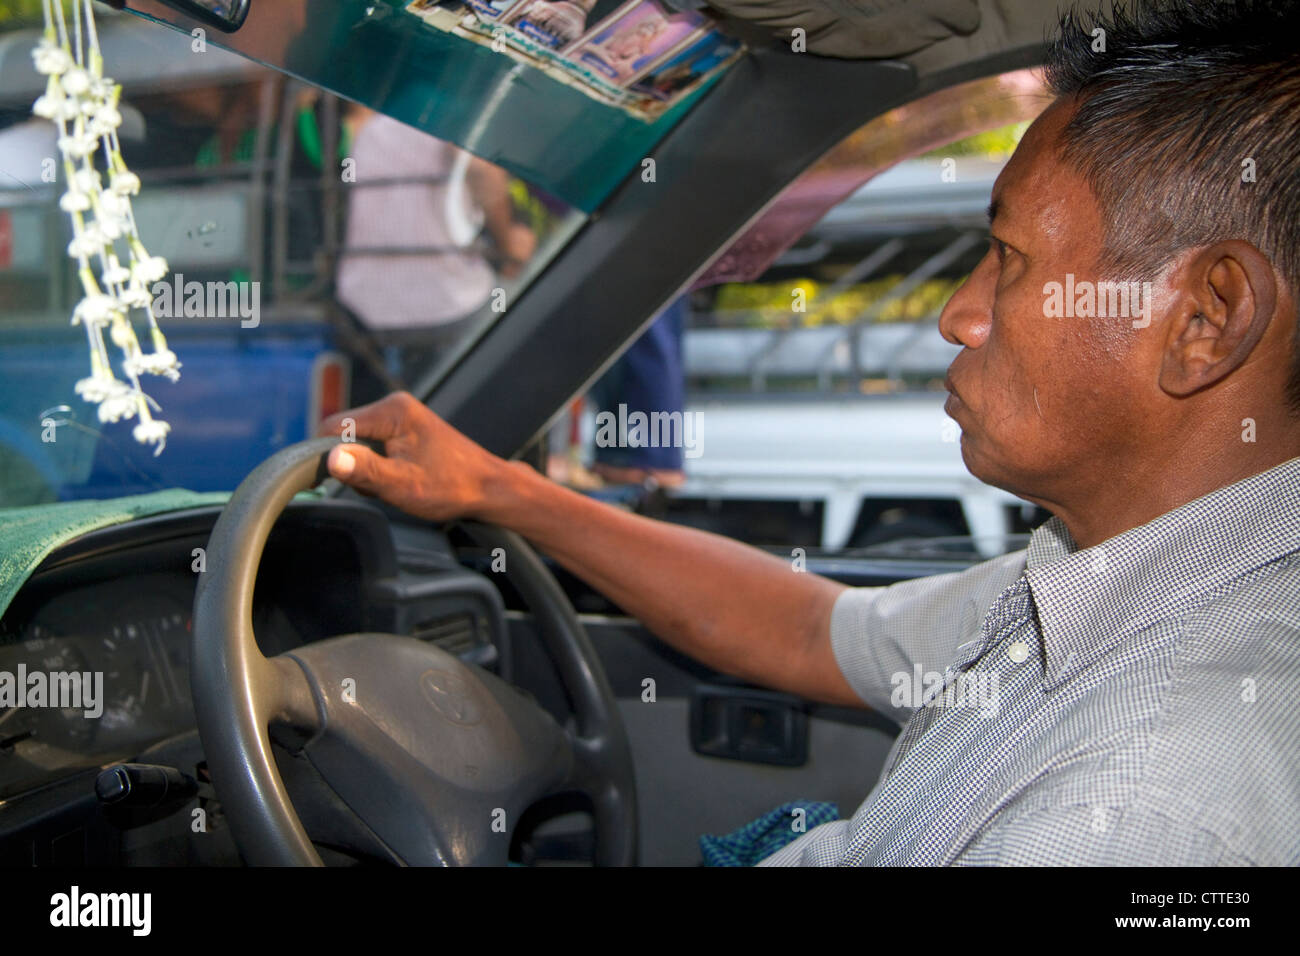 Taxista birmano en Yangón (Rangún), Myanmar (Birmania). Imagen De Stock